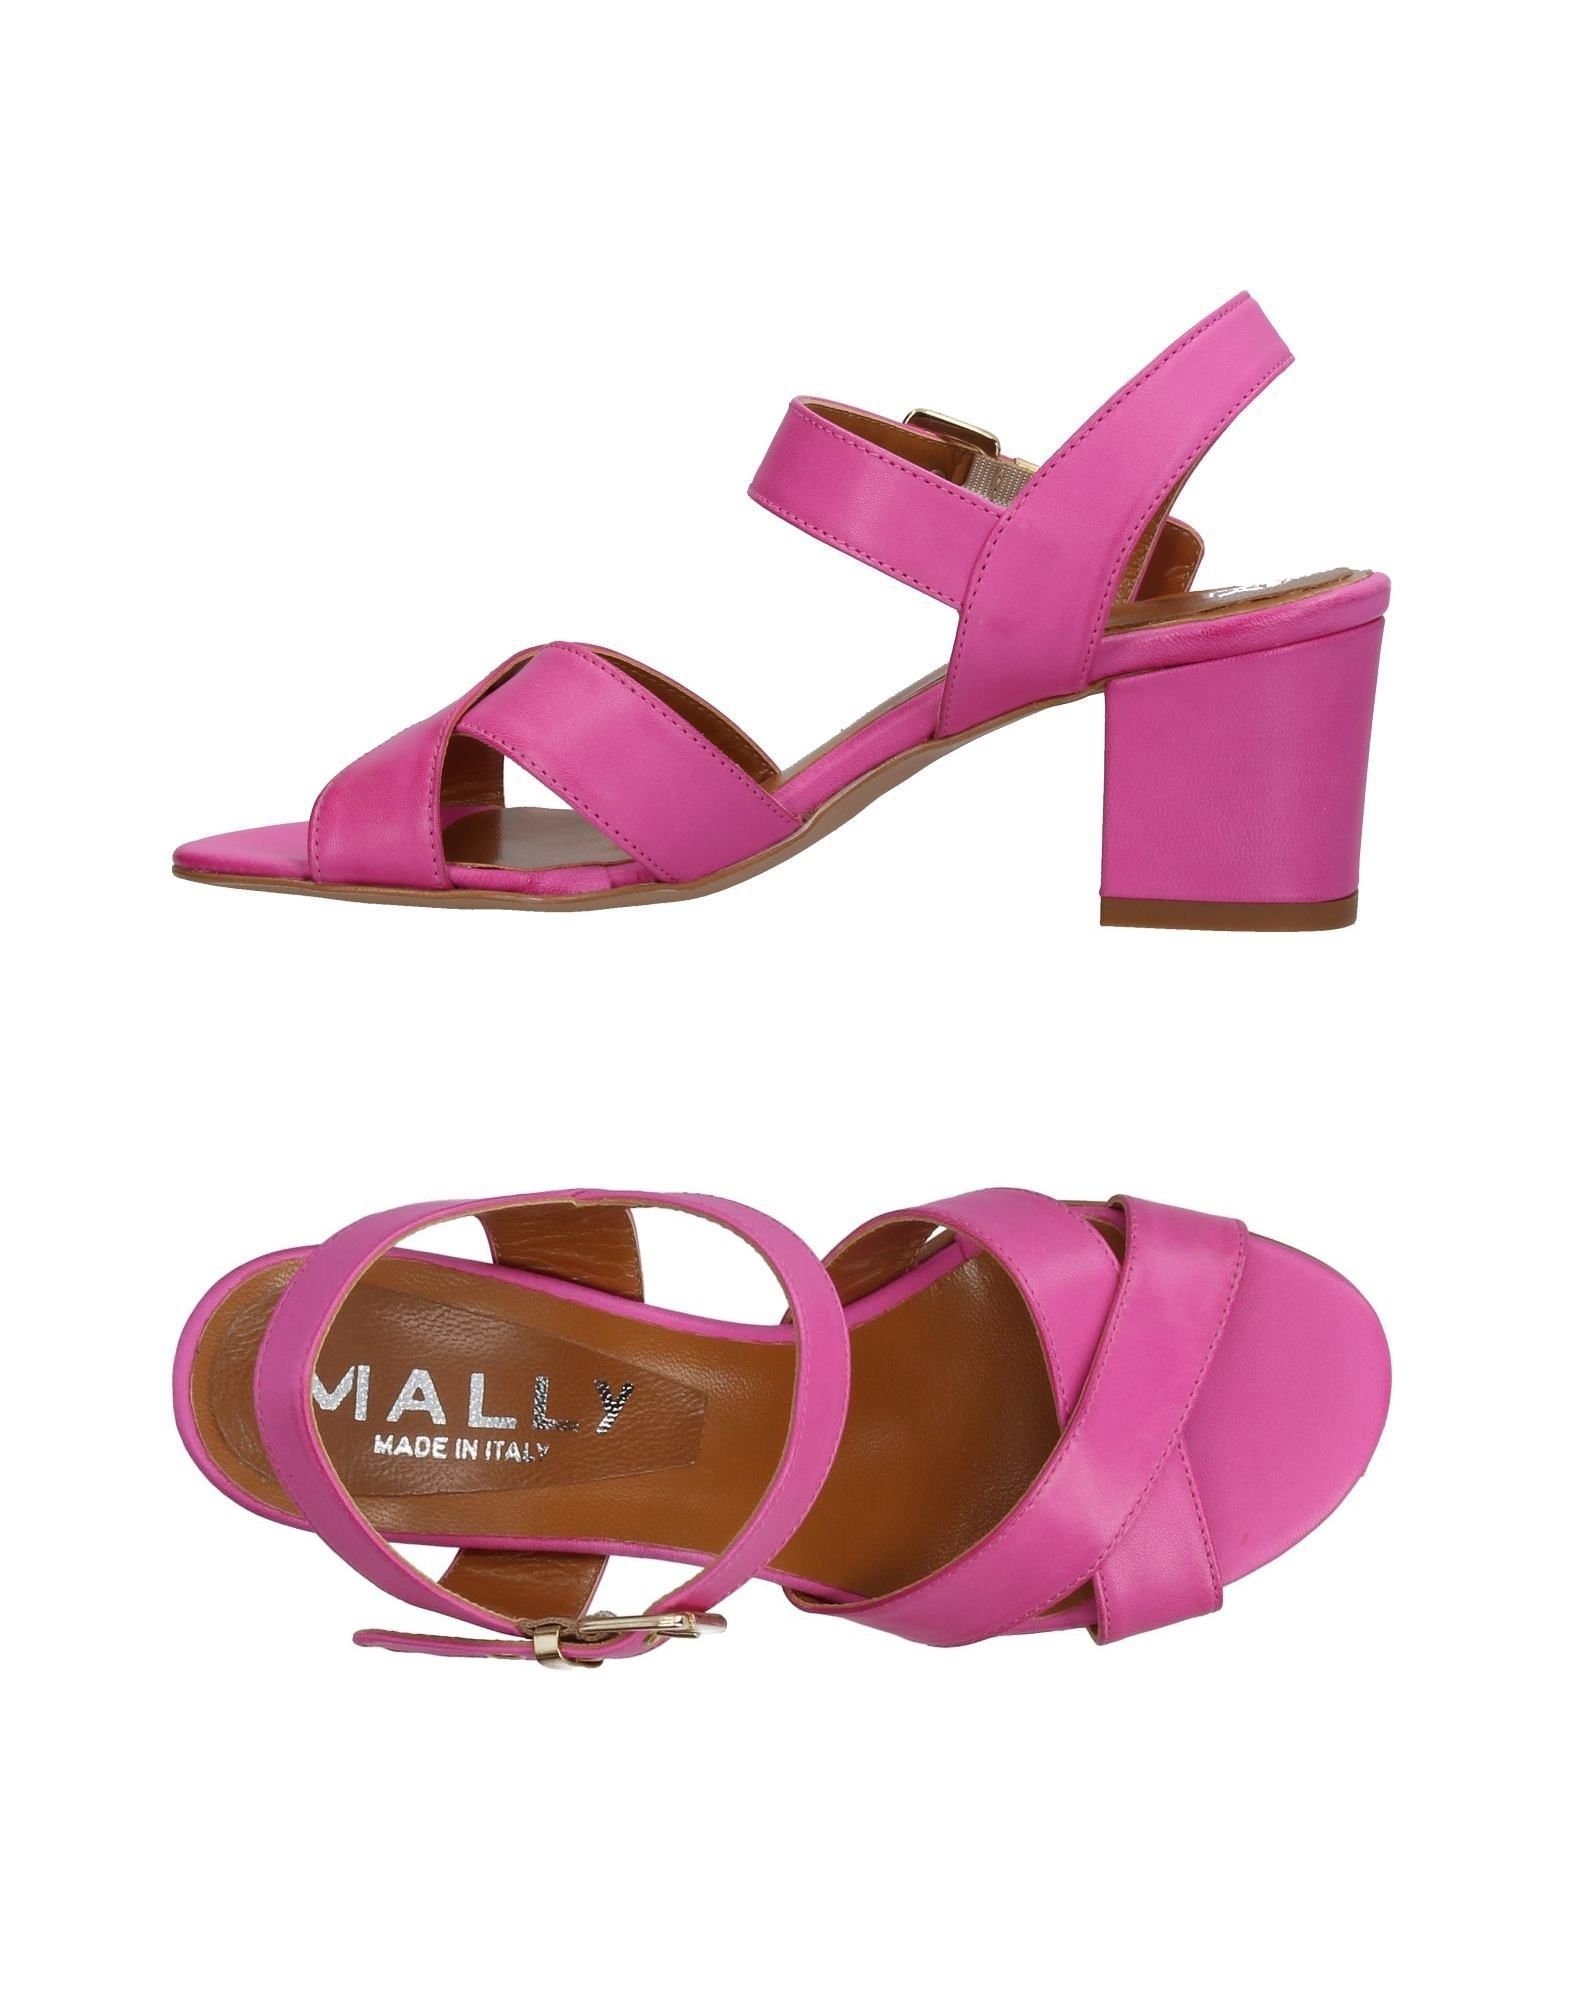 Mally Sandalen Damen  11376233BK Gute Qualität beliebte Schuhe